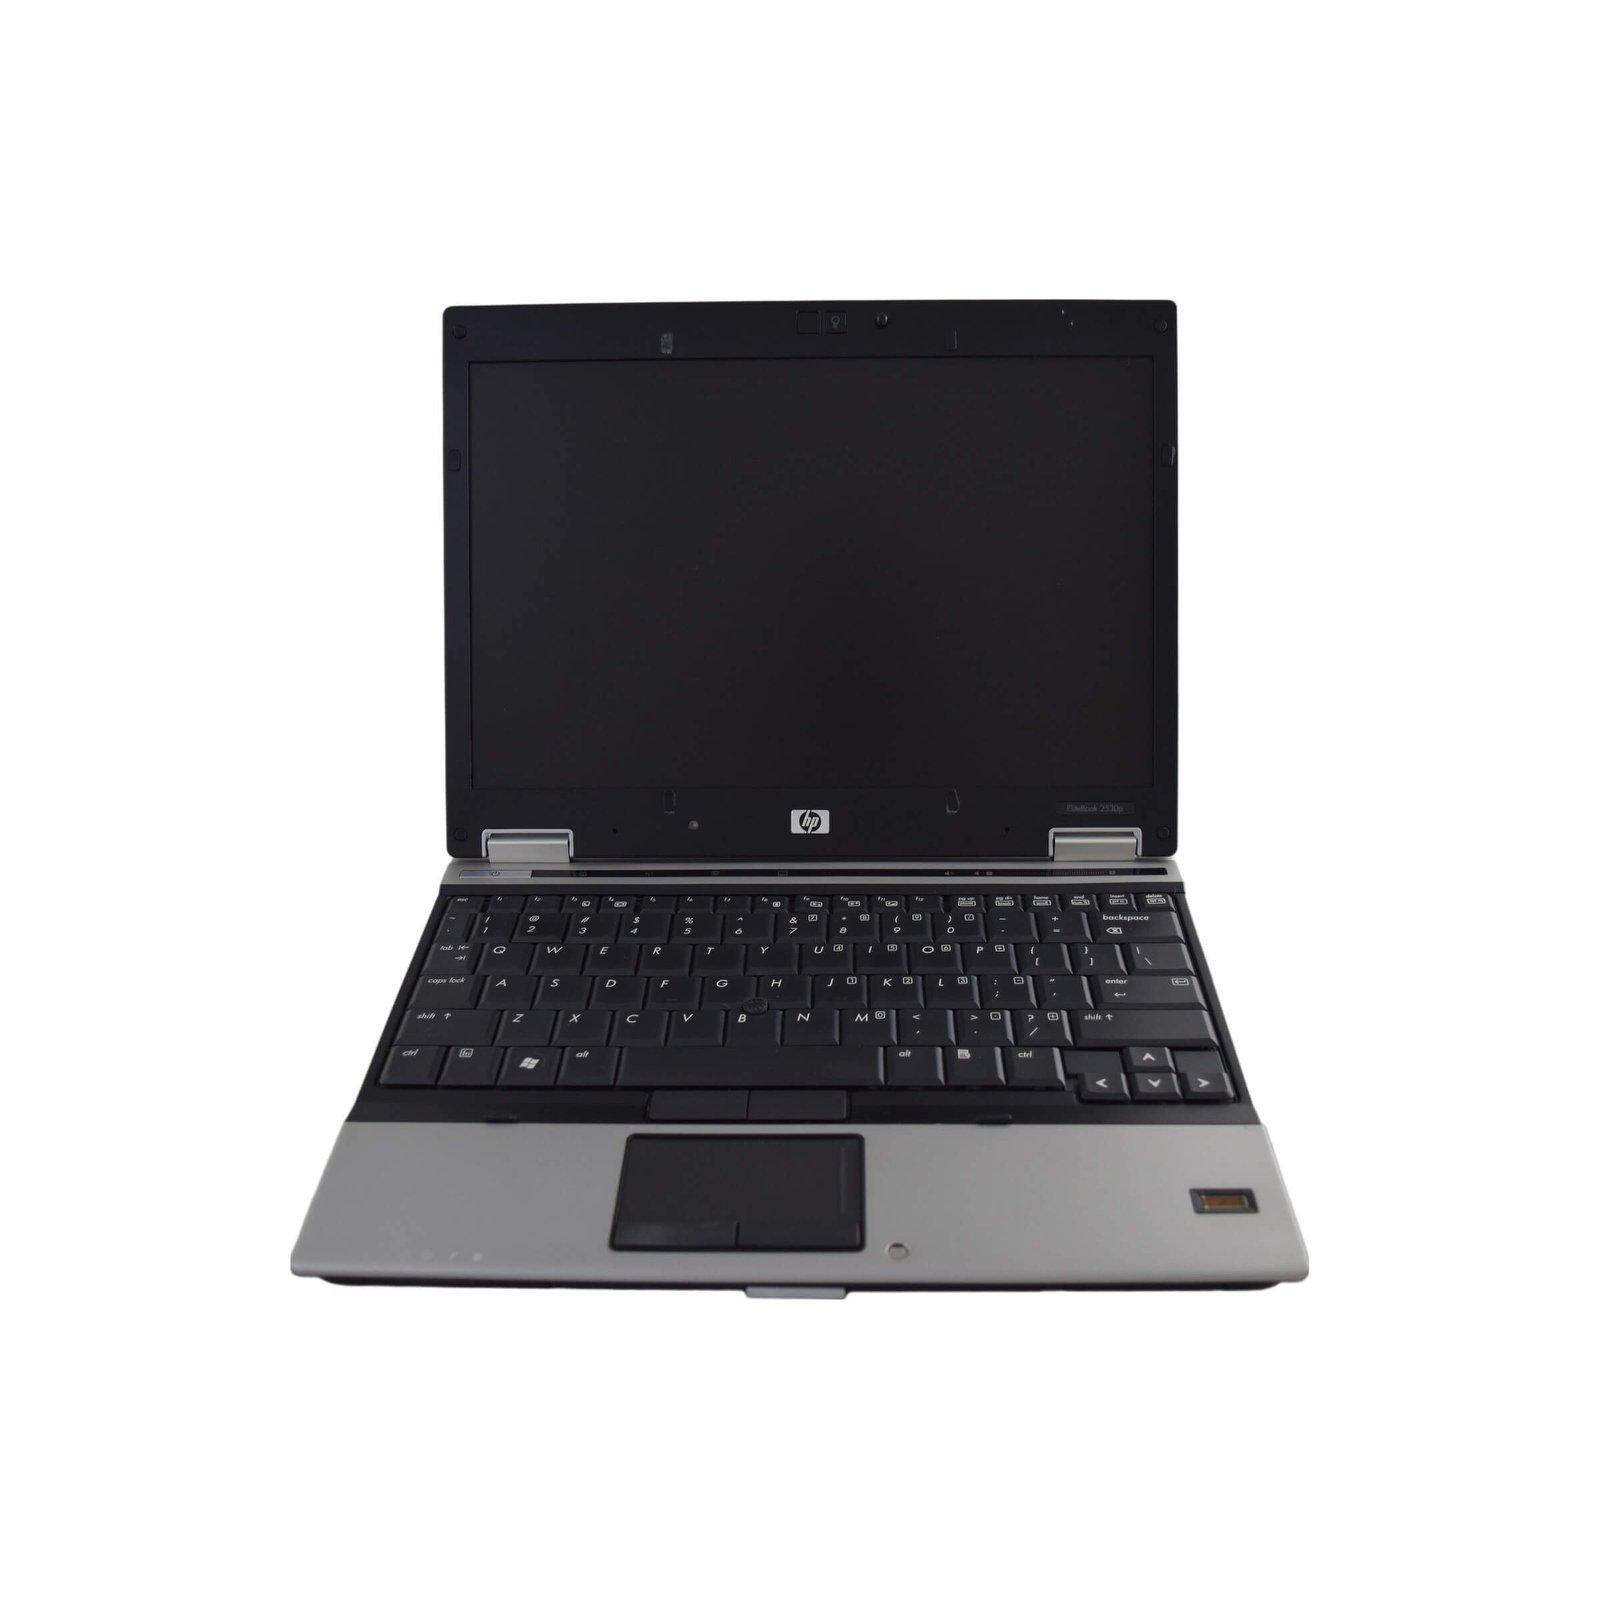 HP Elitebook 2530P 12.1″ Refurbished Laptop – Intel Core 2 Duo SL9400 1.86 GHz 4GB 100GB SSD DVD-ROM Windows 7 Pro 64-Bit